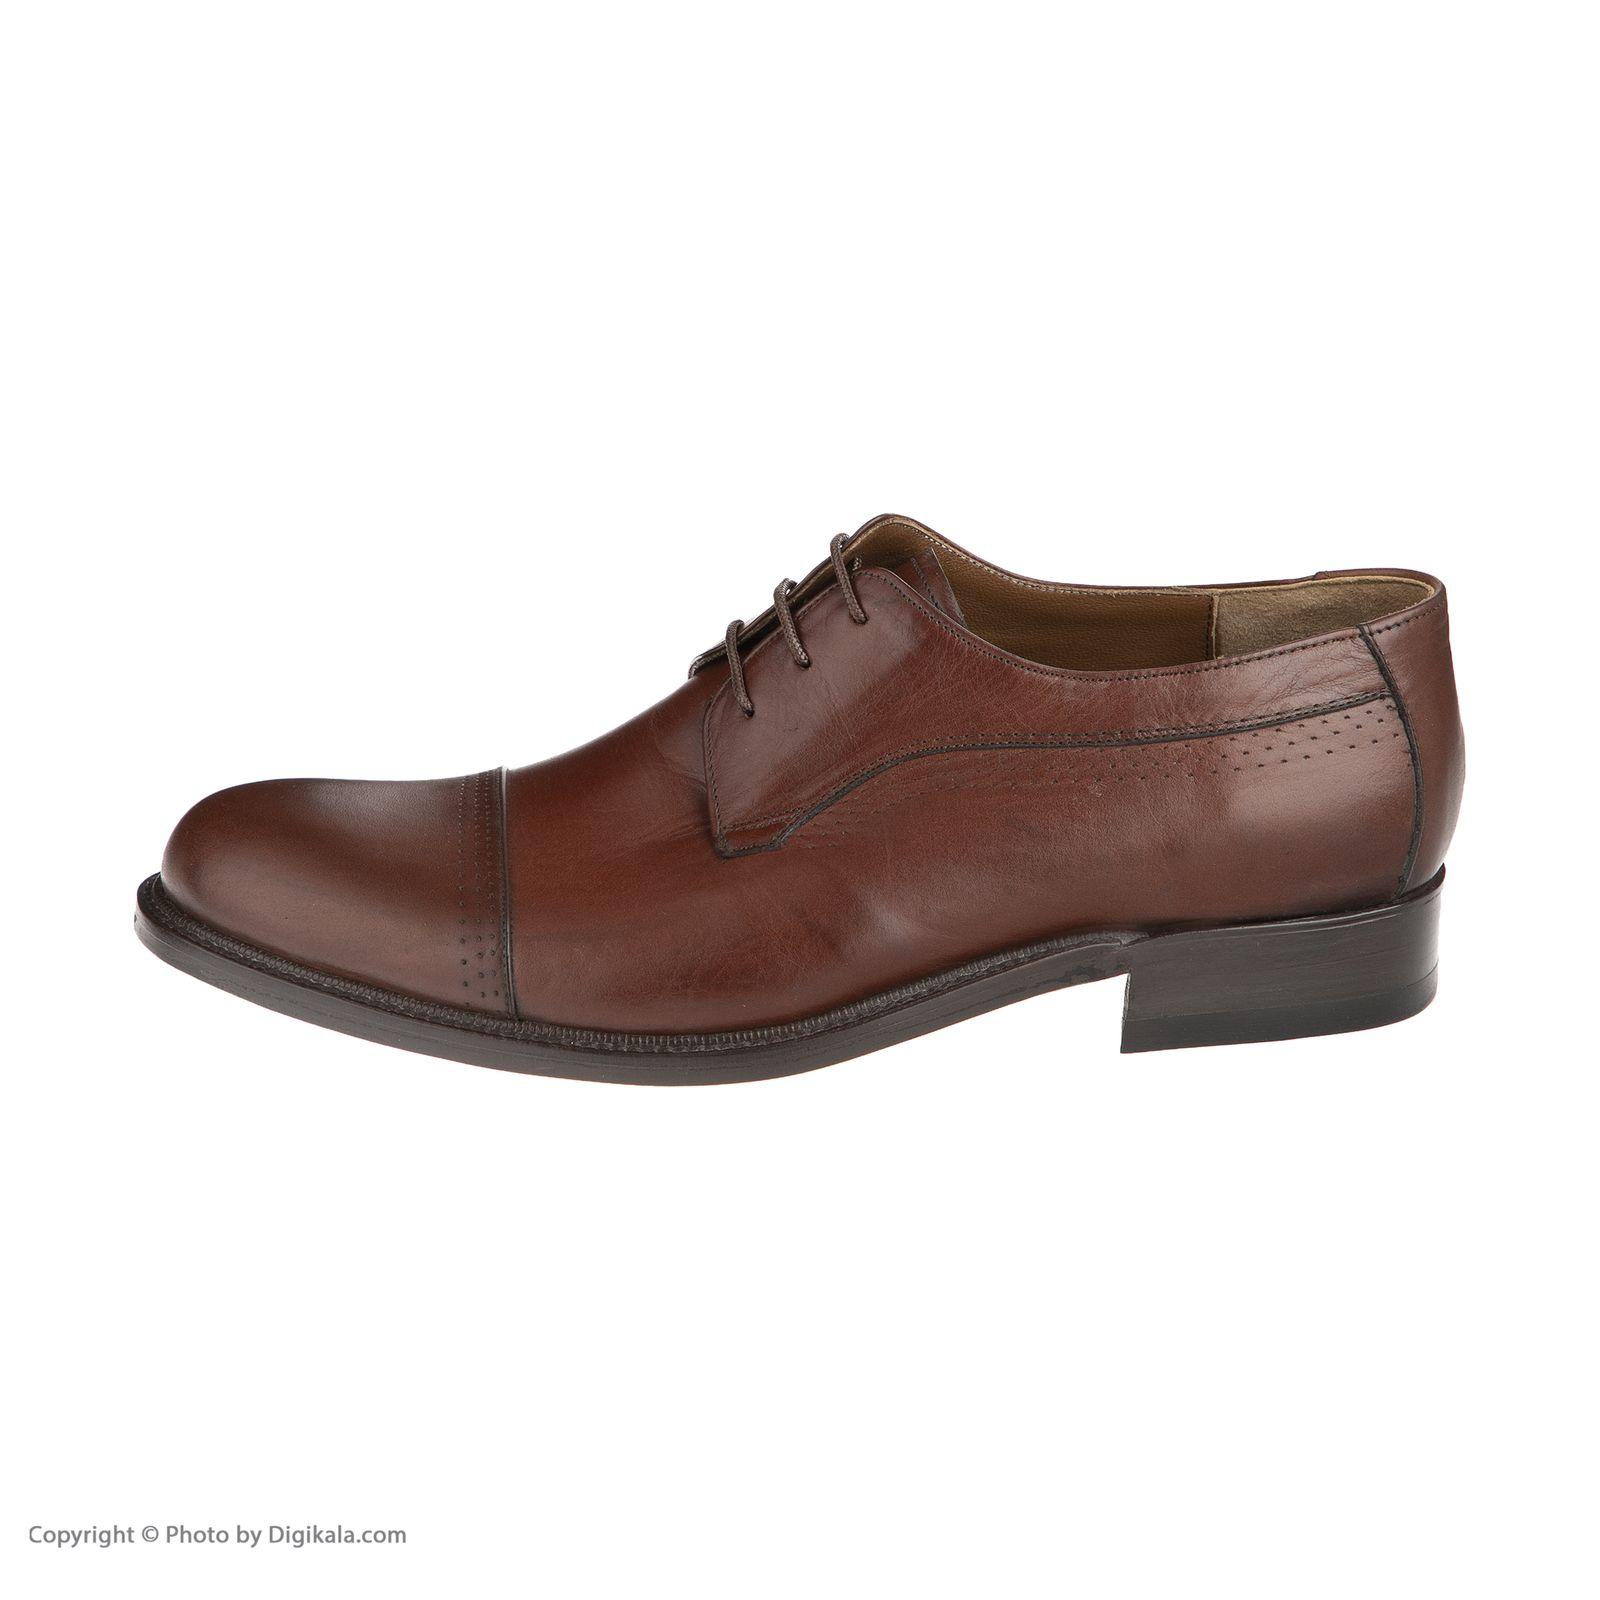 کفش مردانه نظری کد 431 -  - 1